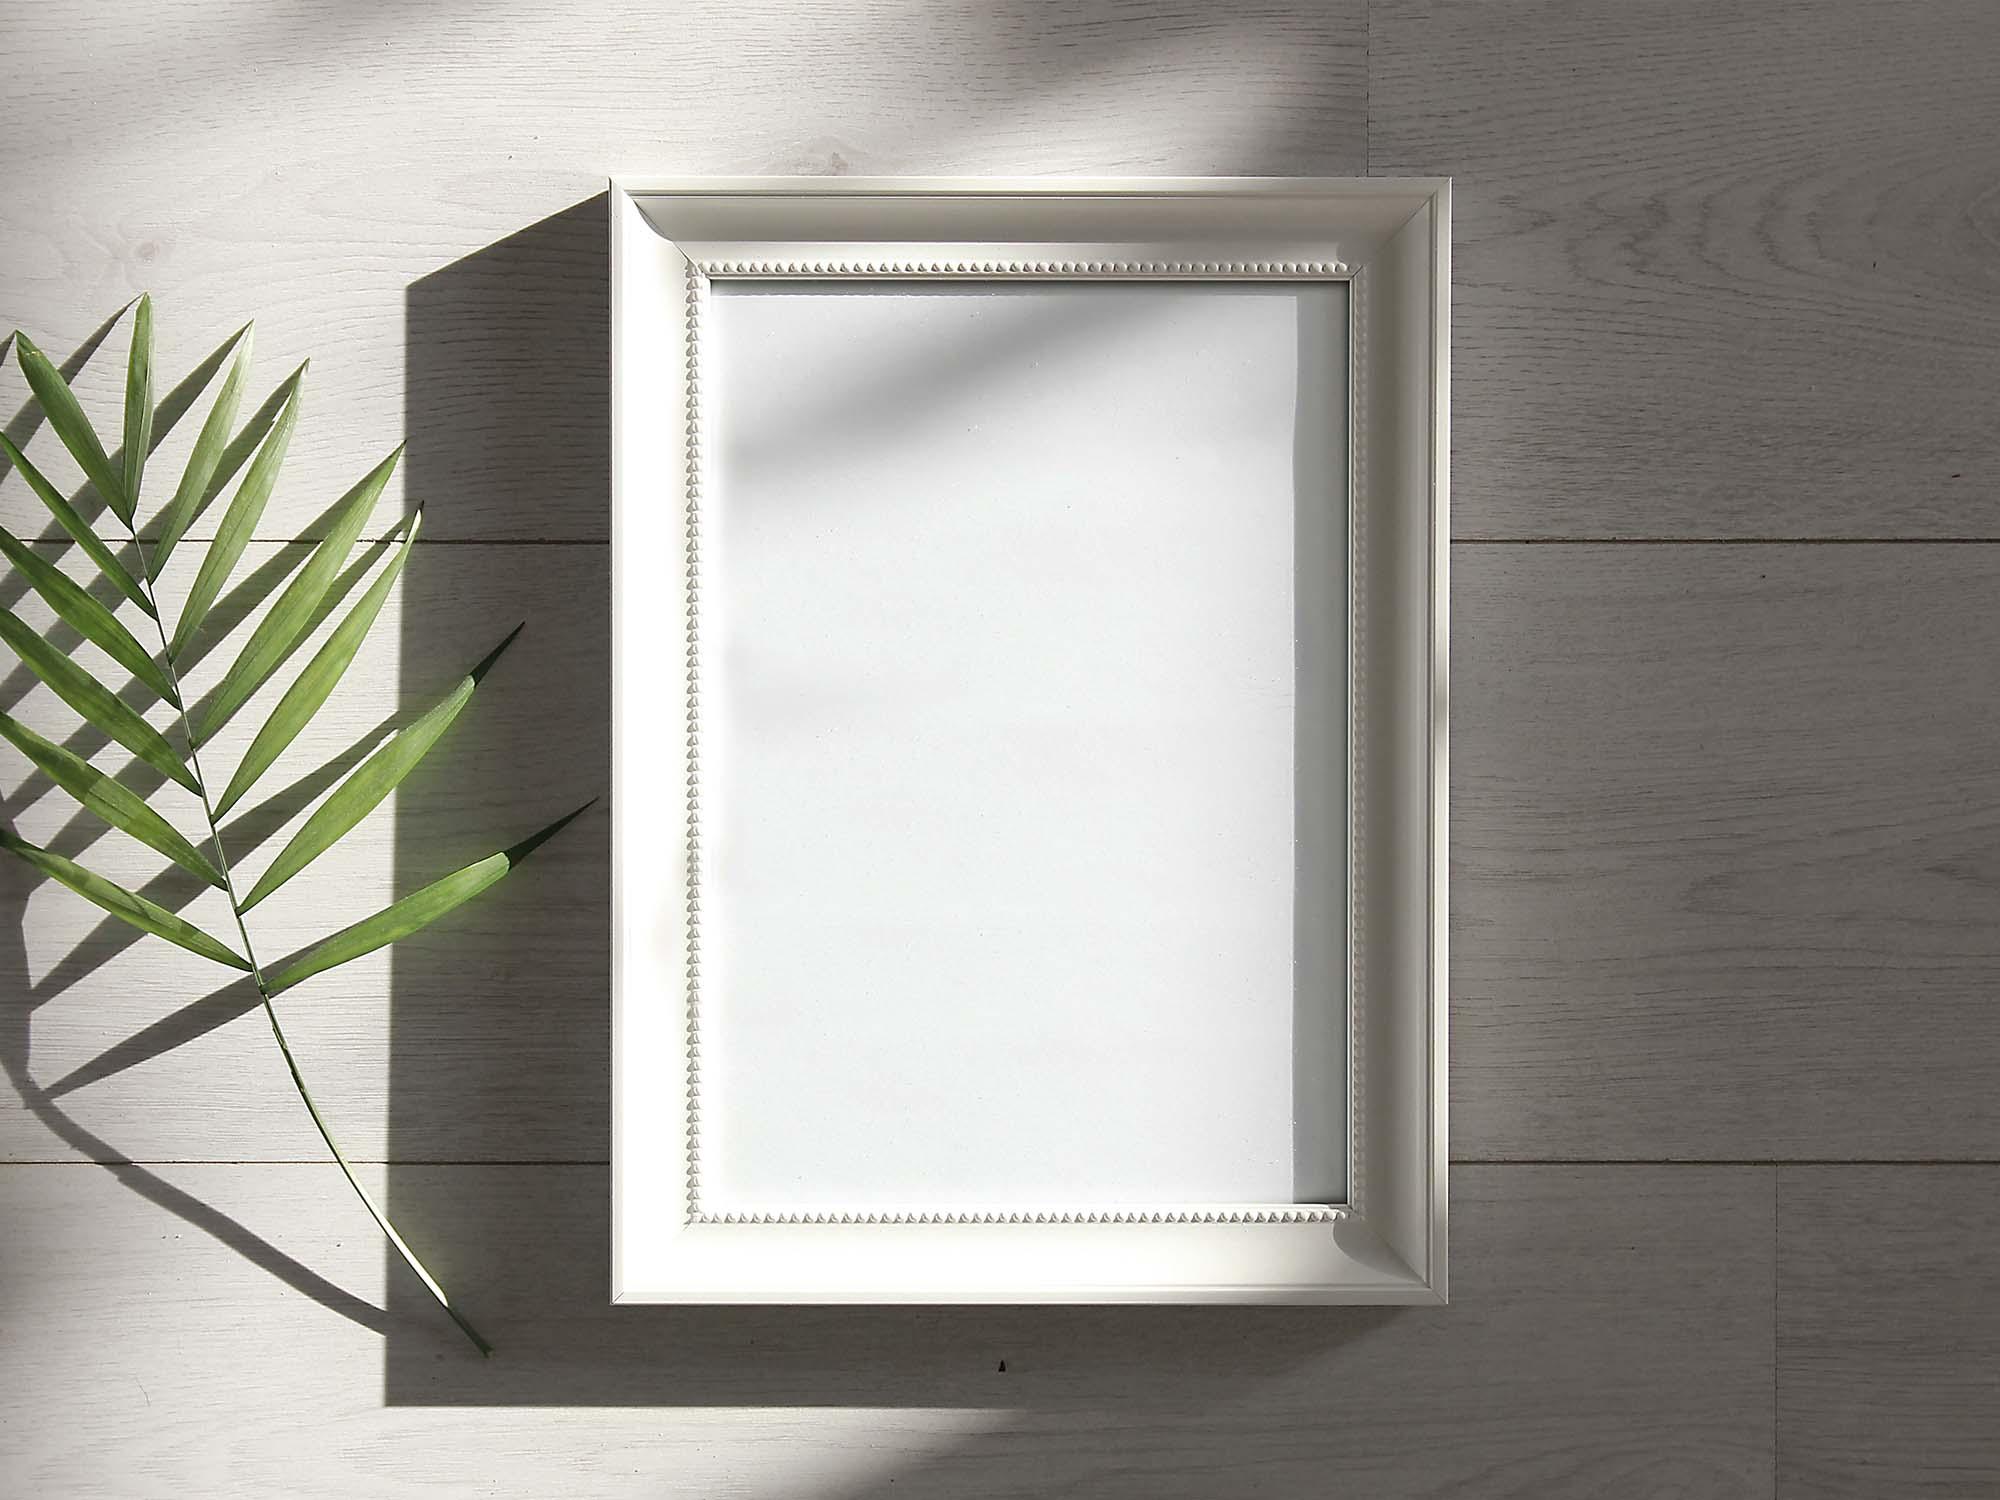 Photo Frame Under Sunlight Mockup 2